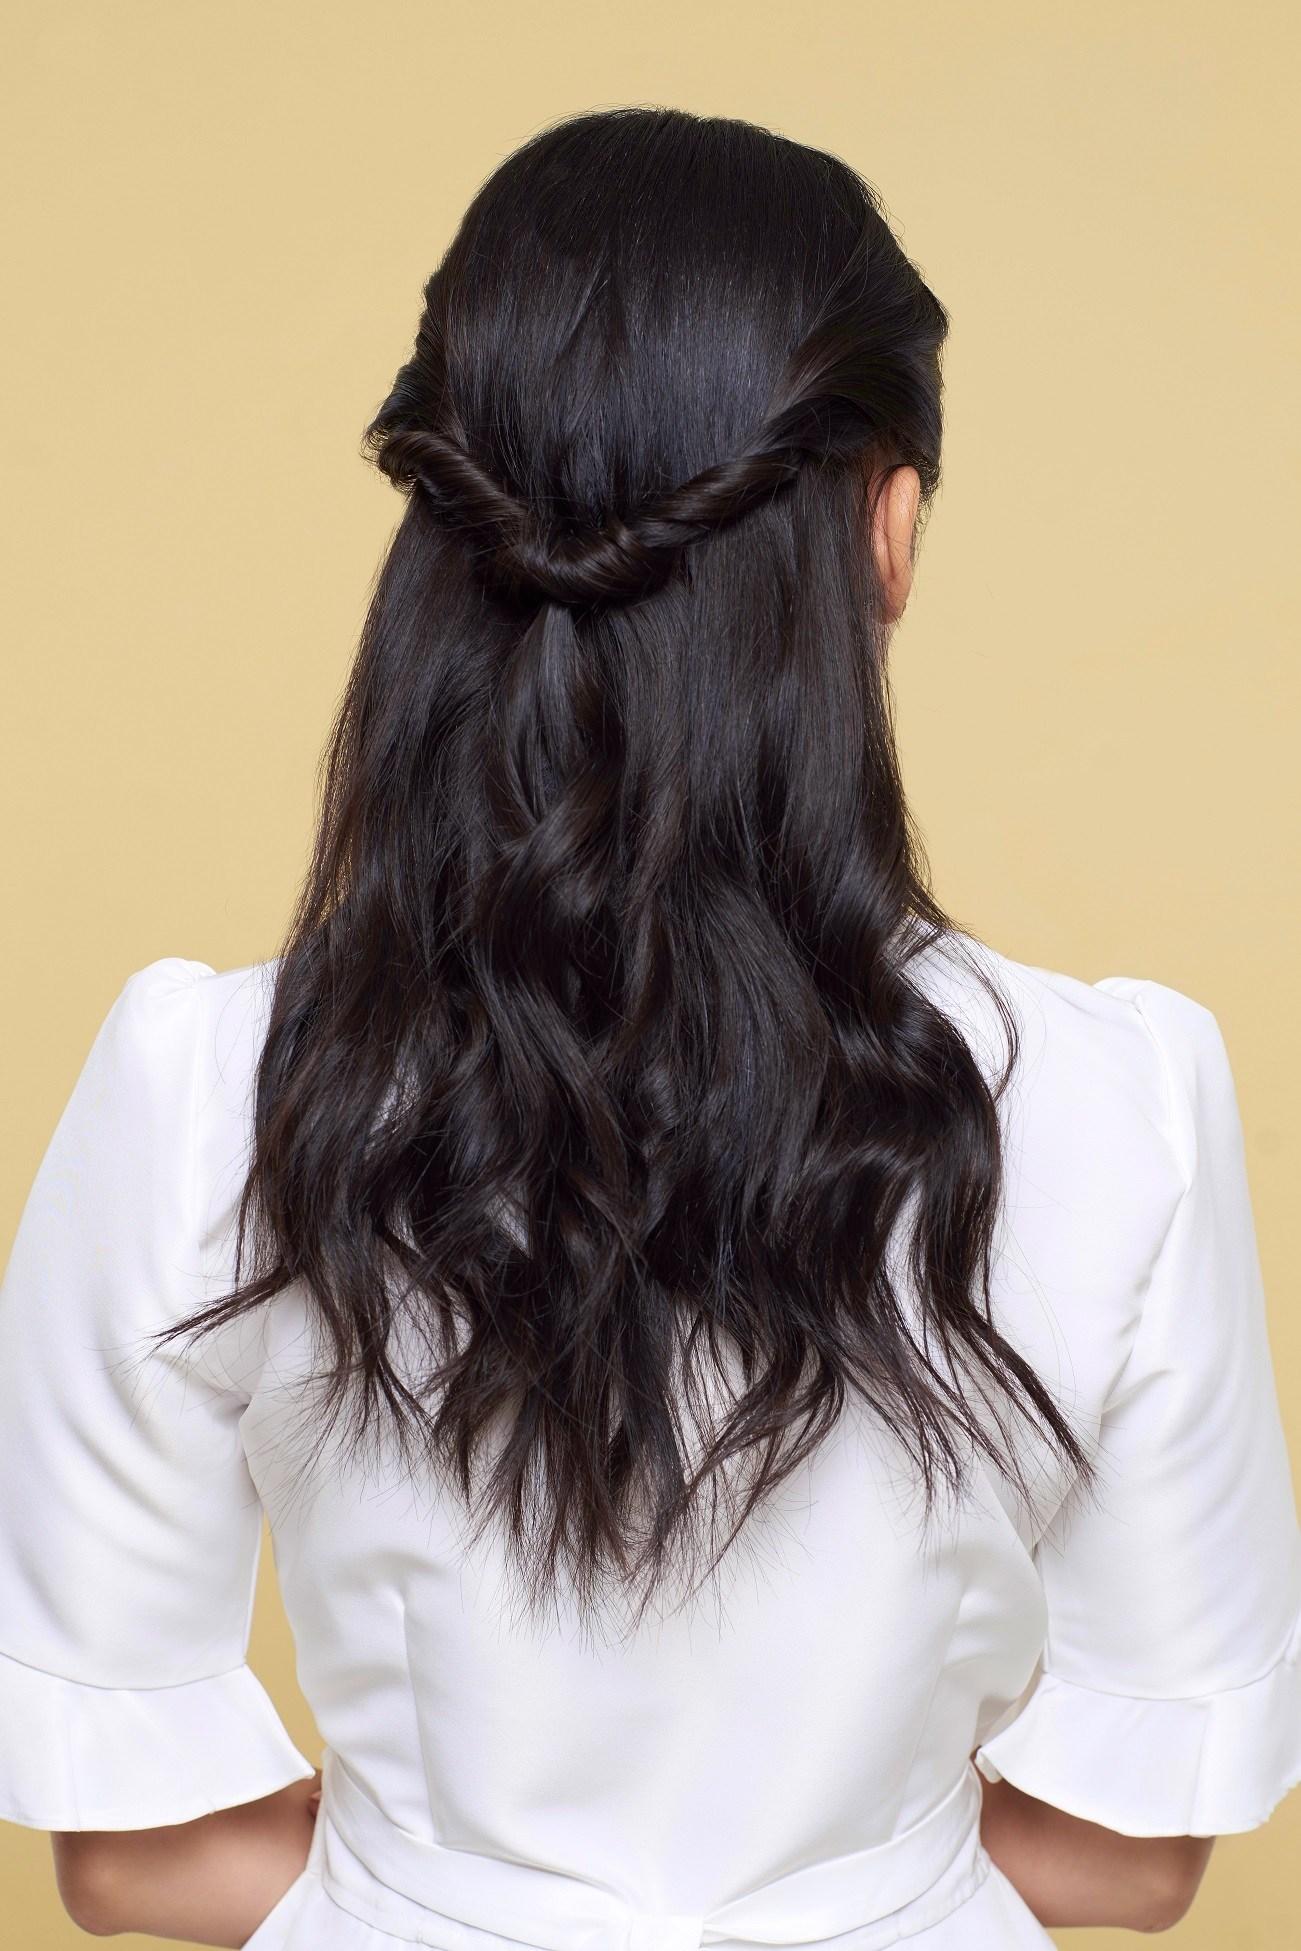 7 Cara Menata Gaya Rambut Prom Dalam Waktu Singkat